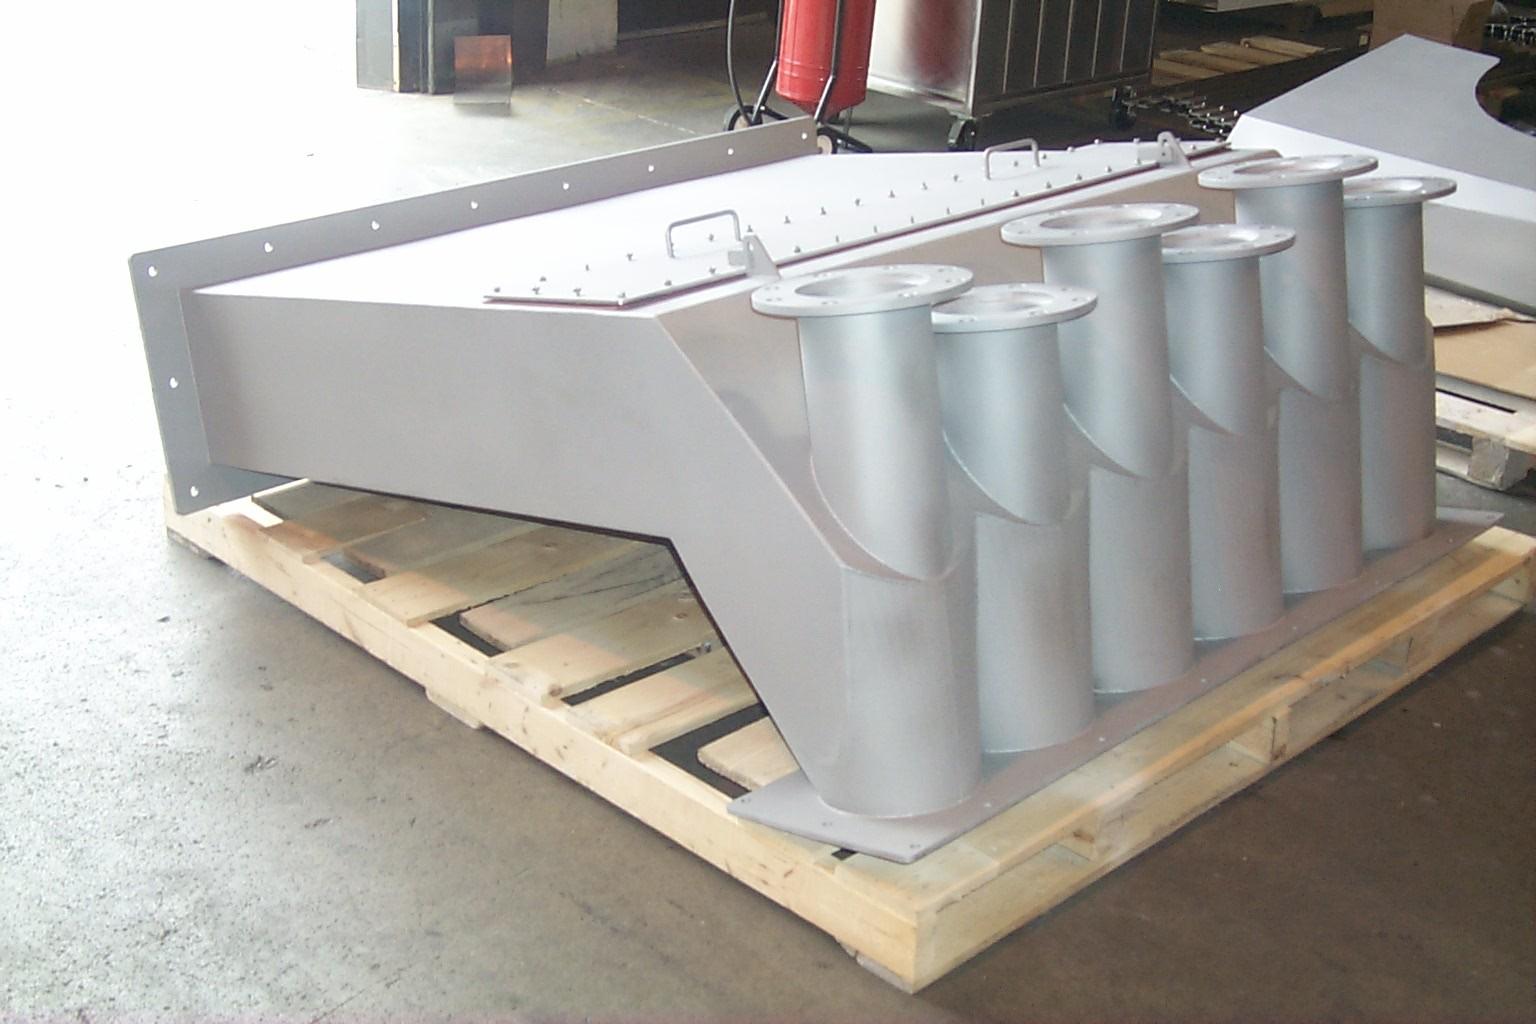 Bead Blasting Stainless Steel – Epoxy Systems Blasting & Coating